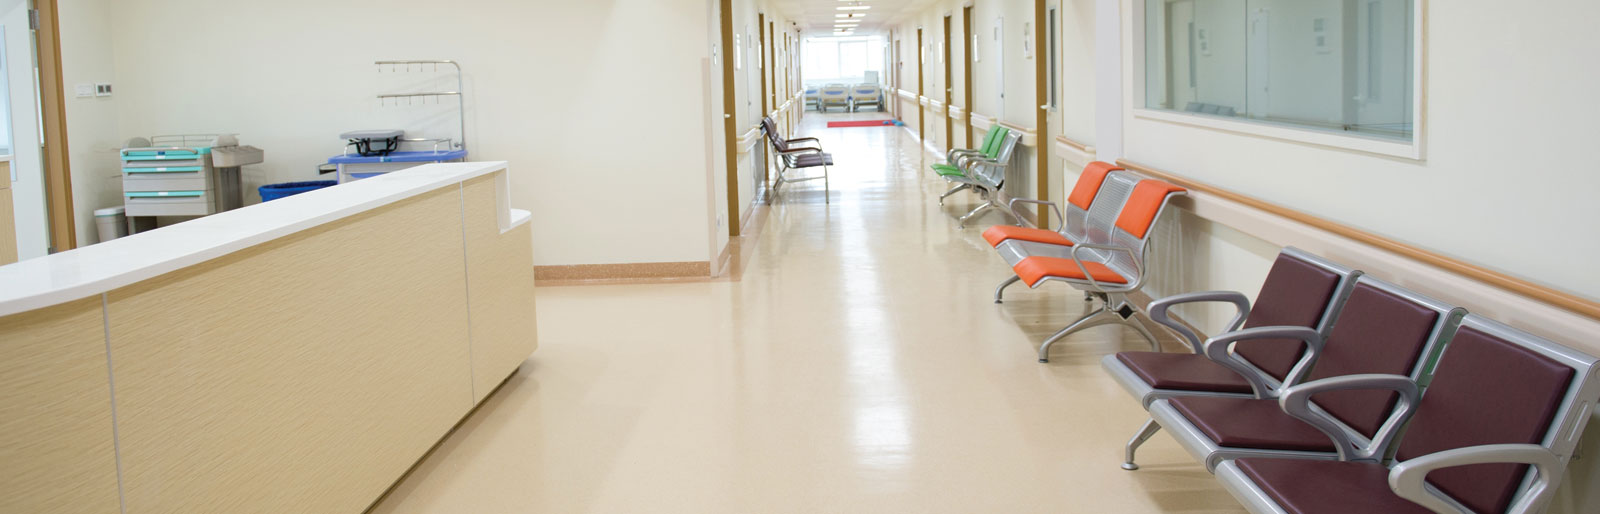 home-banner-hospital